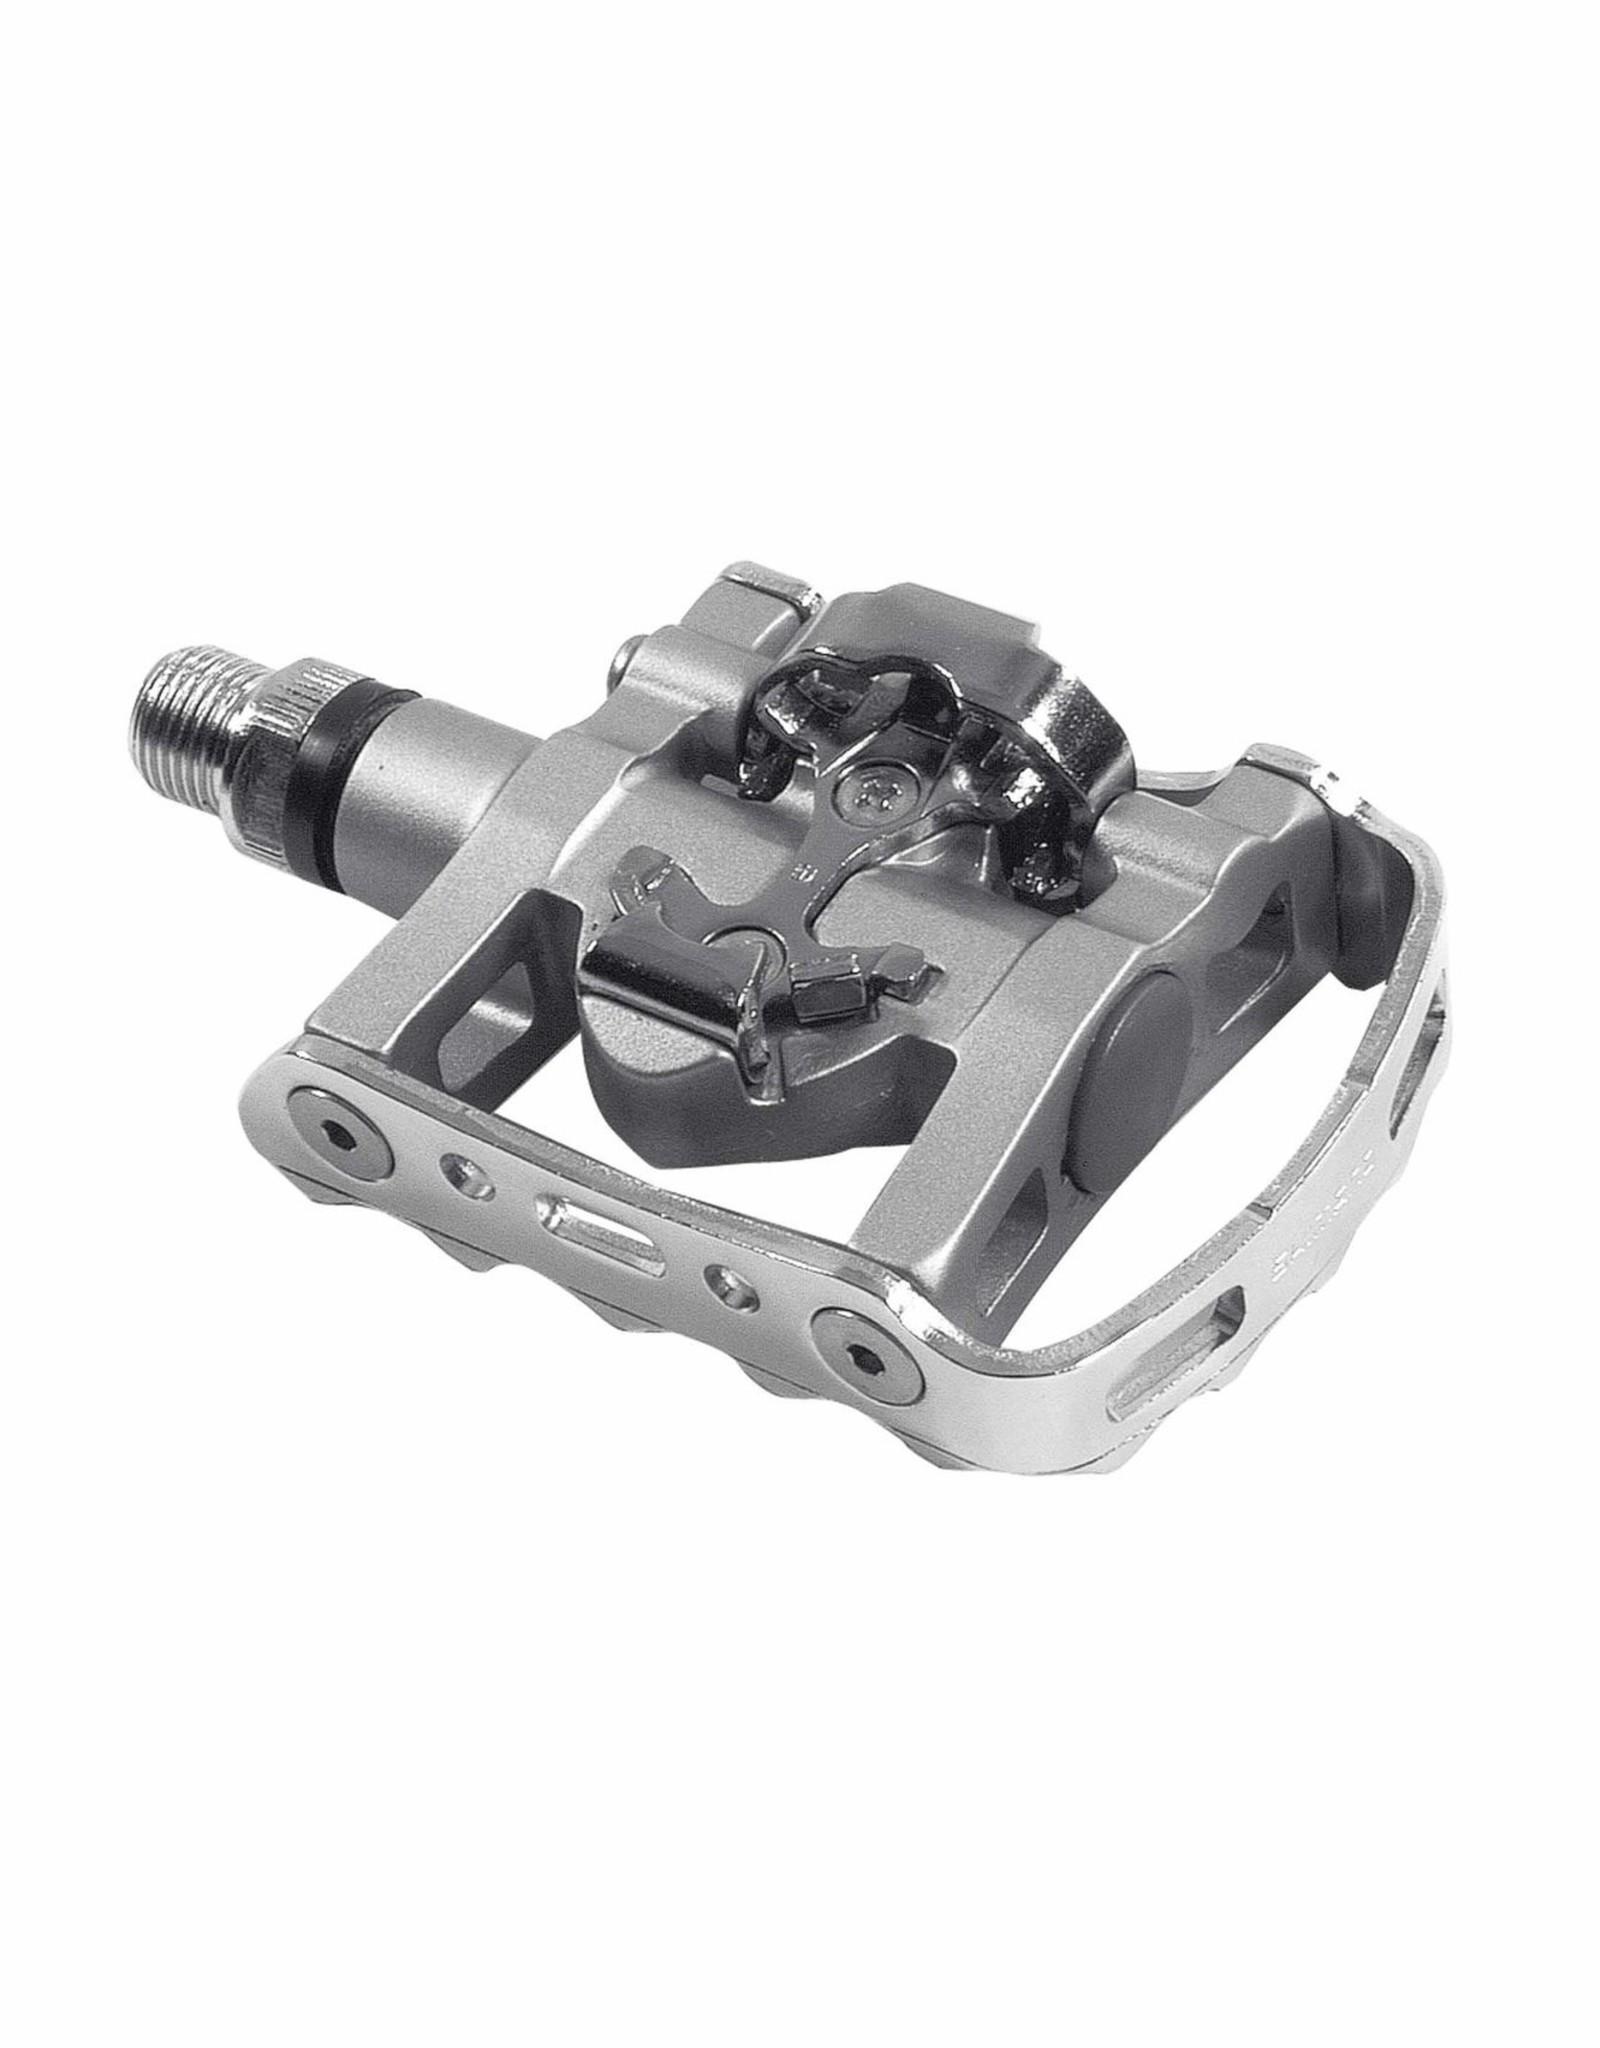 Shimano Pedals - Shimano PD-M324 (SPD/Flats)